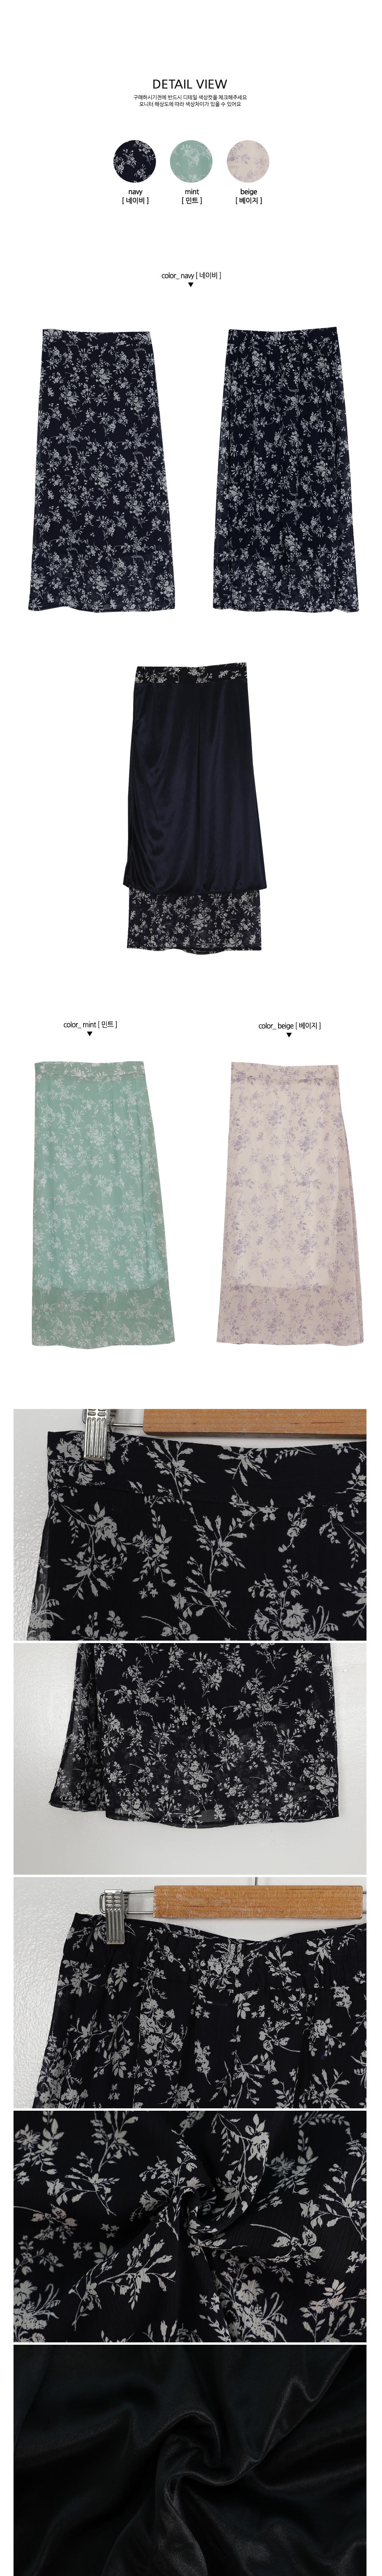 El Flalong Skirt